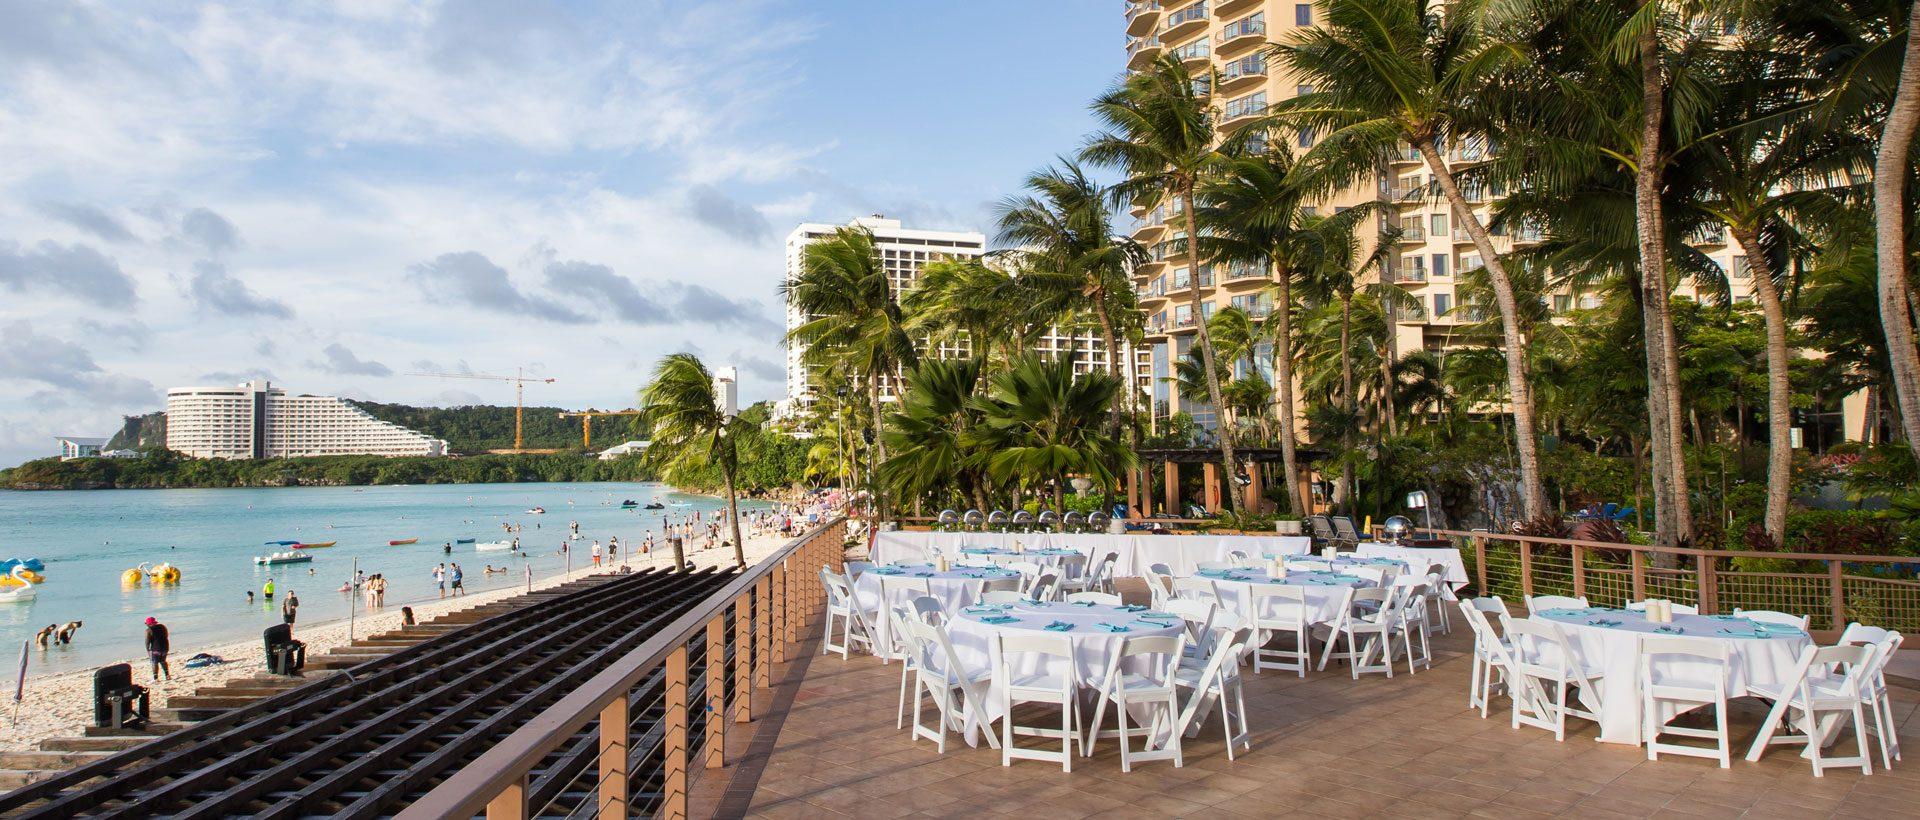 dusit-beach-resort-guam-meetings-events-(7)